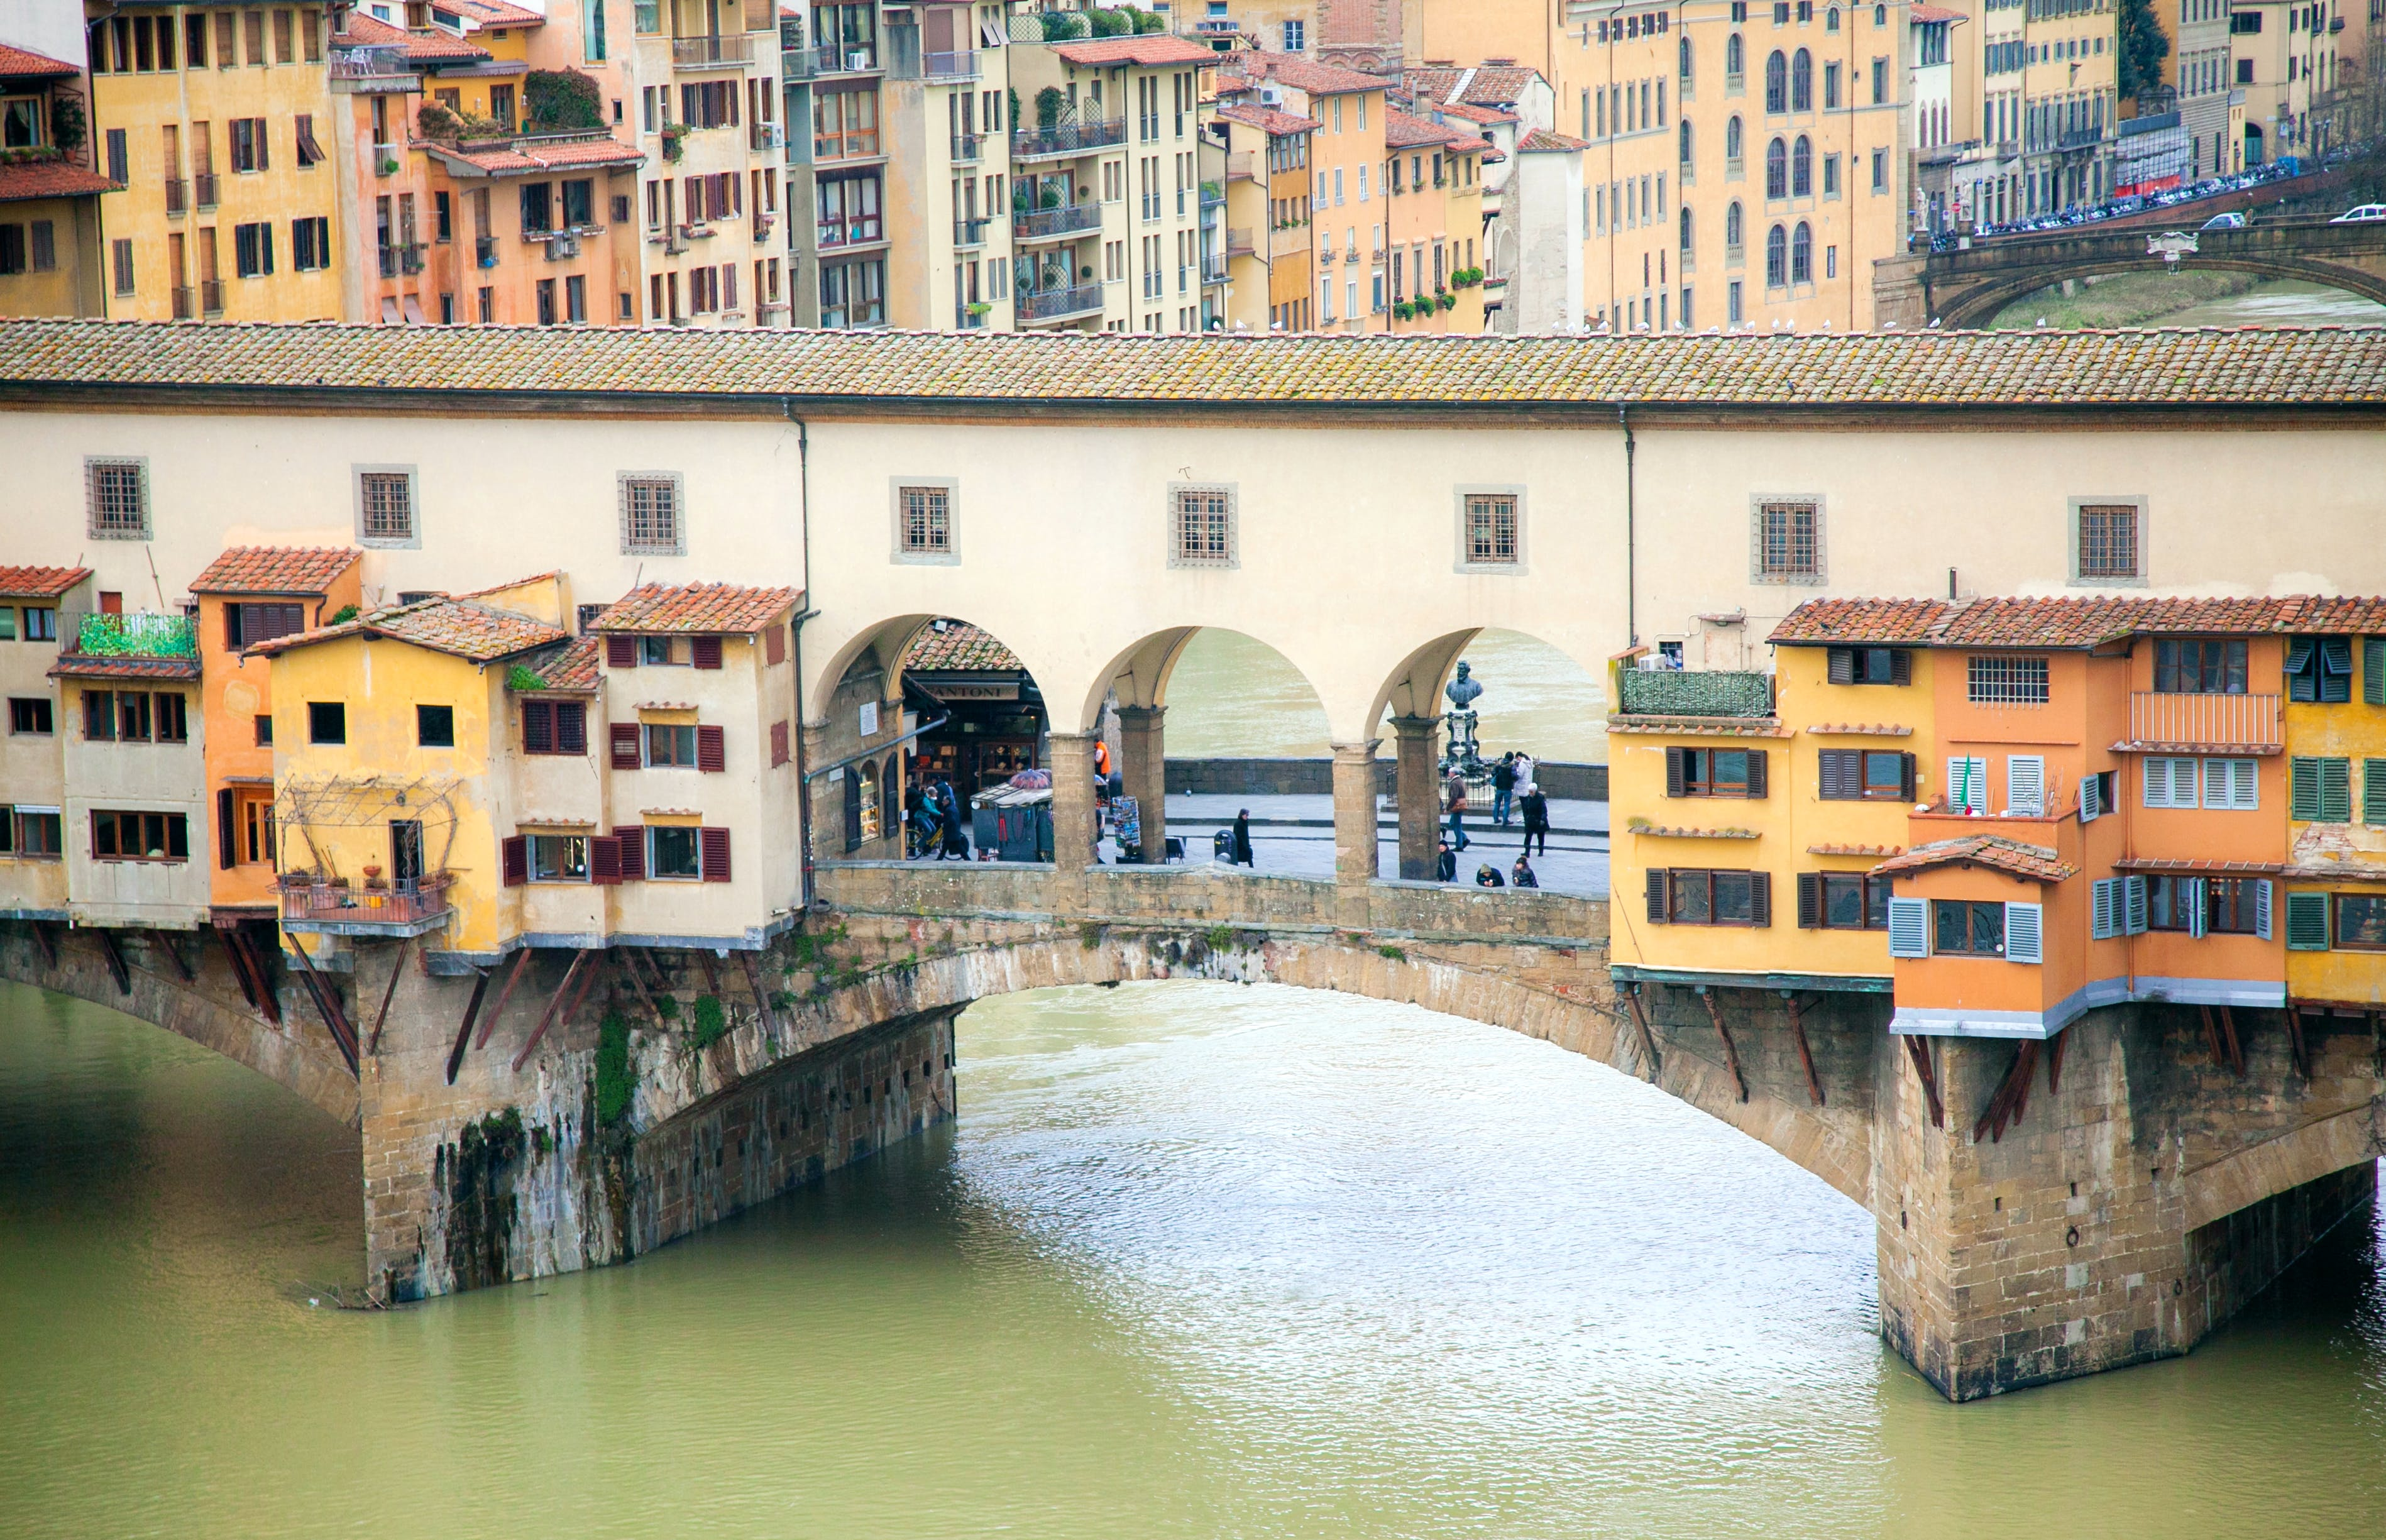 Florence Italy 2021 Tourist Travel